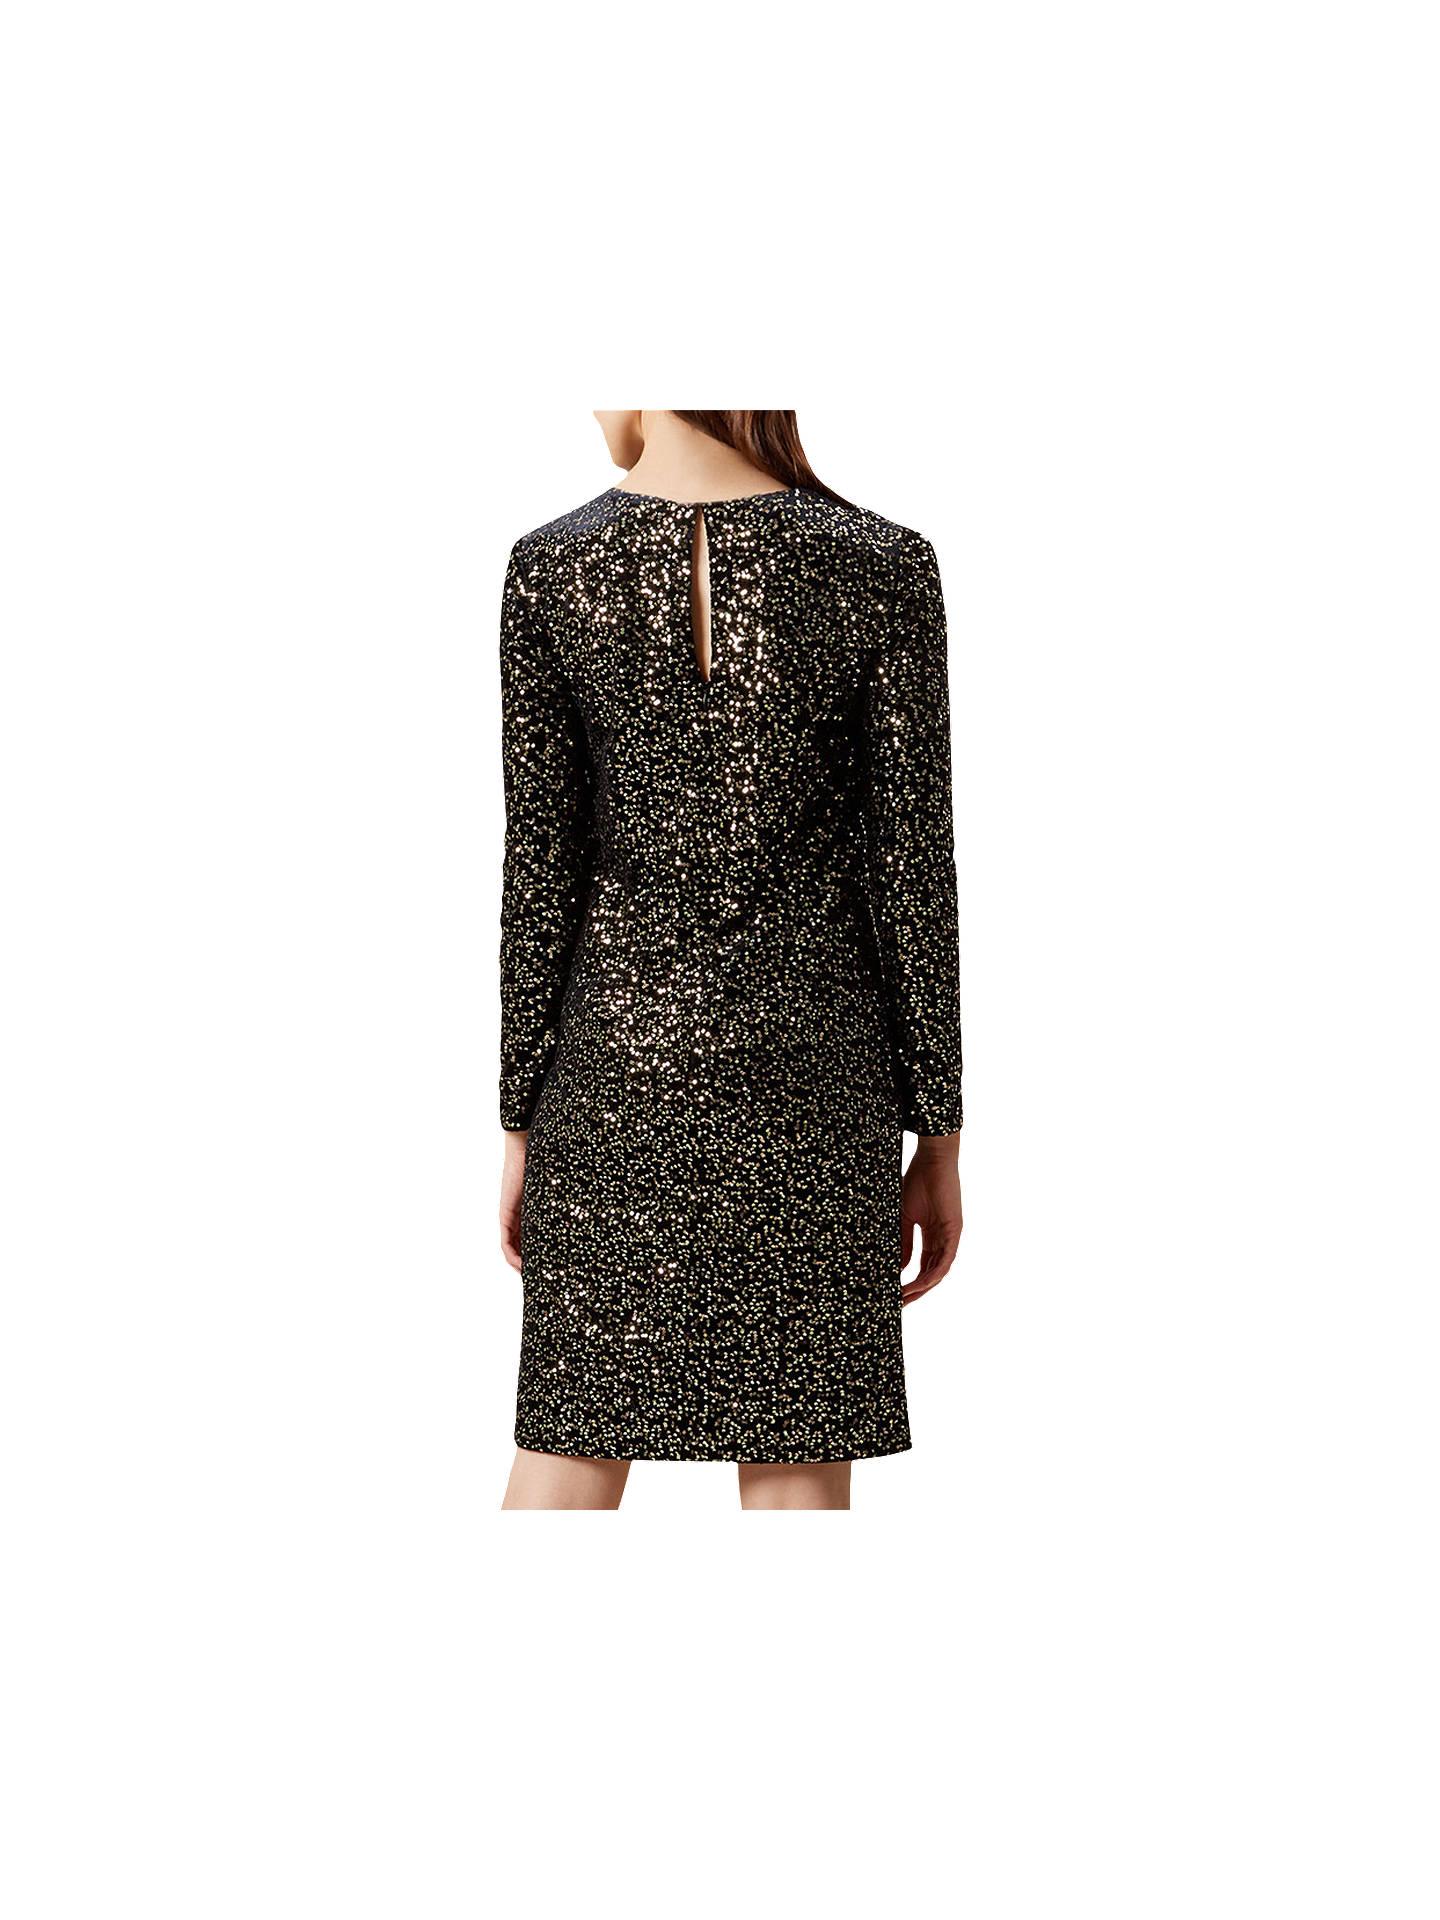 054ac24f ... Buy Hobbs Mia Sequin Dress, Black/Gold, 6 Online at johnlewis.com ...